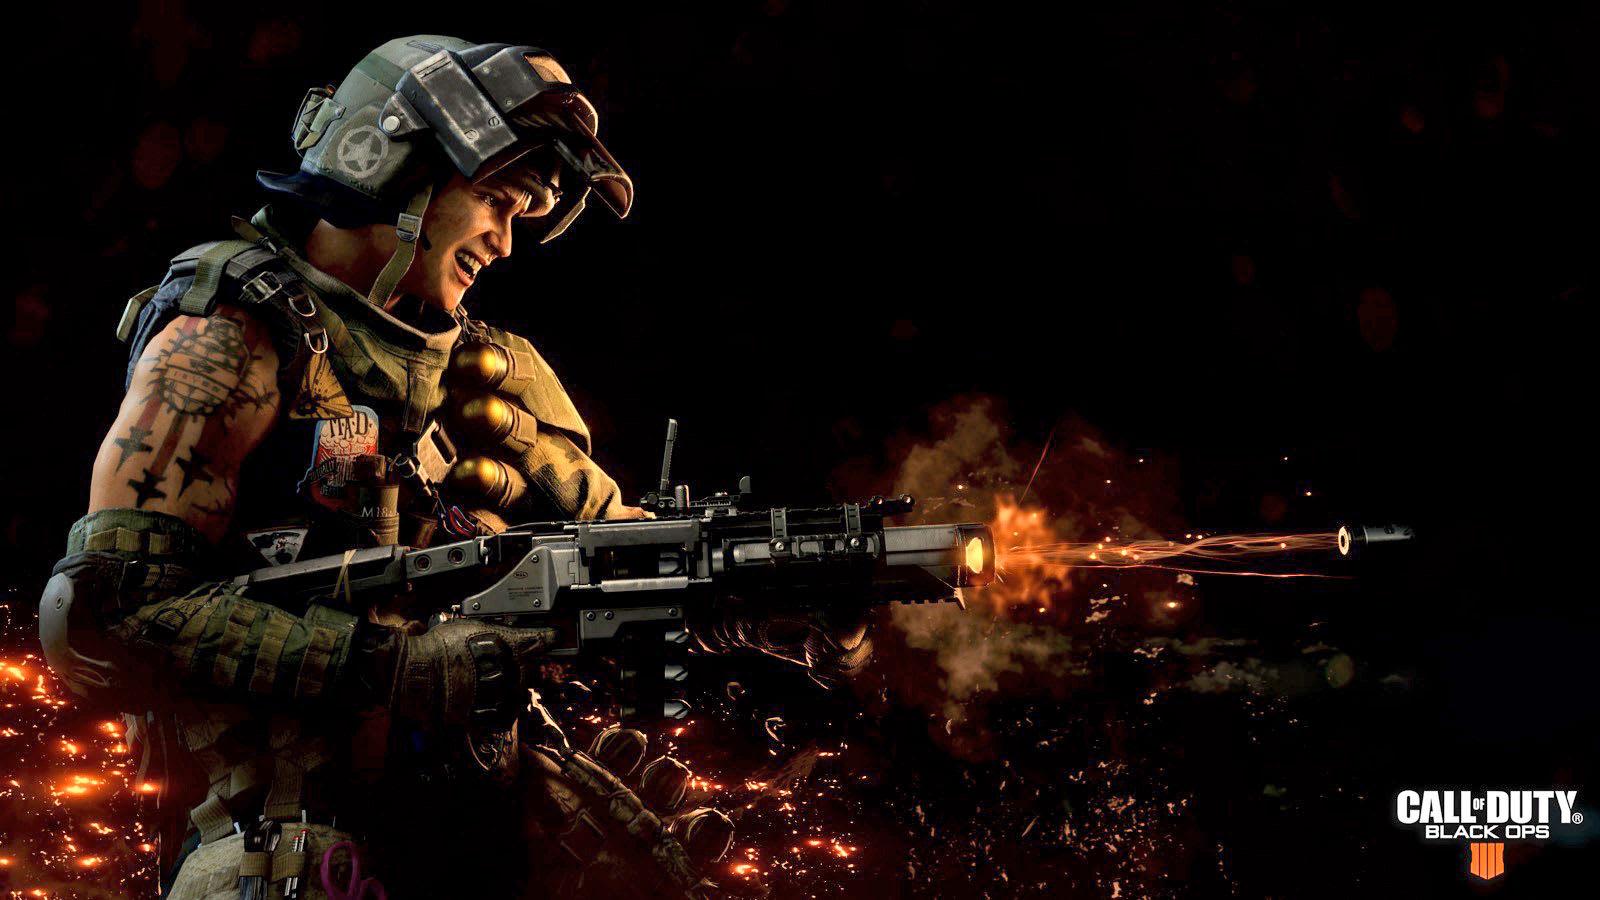 Call Of Duty Black Ops 4 Tweaks A Familiar Multiplayer Formula